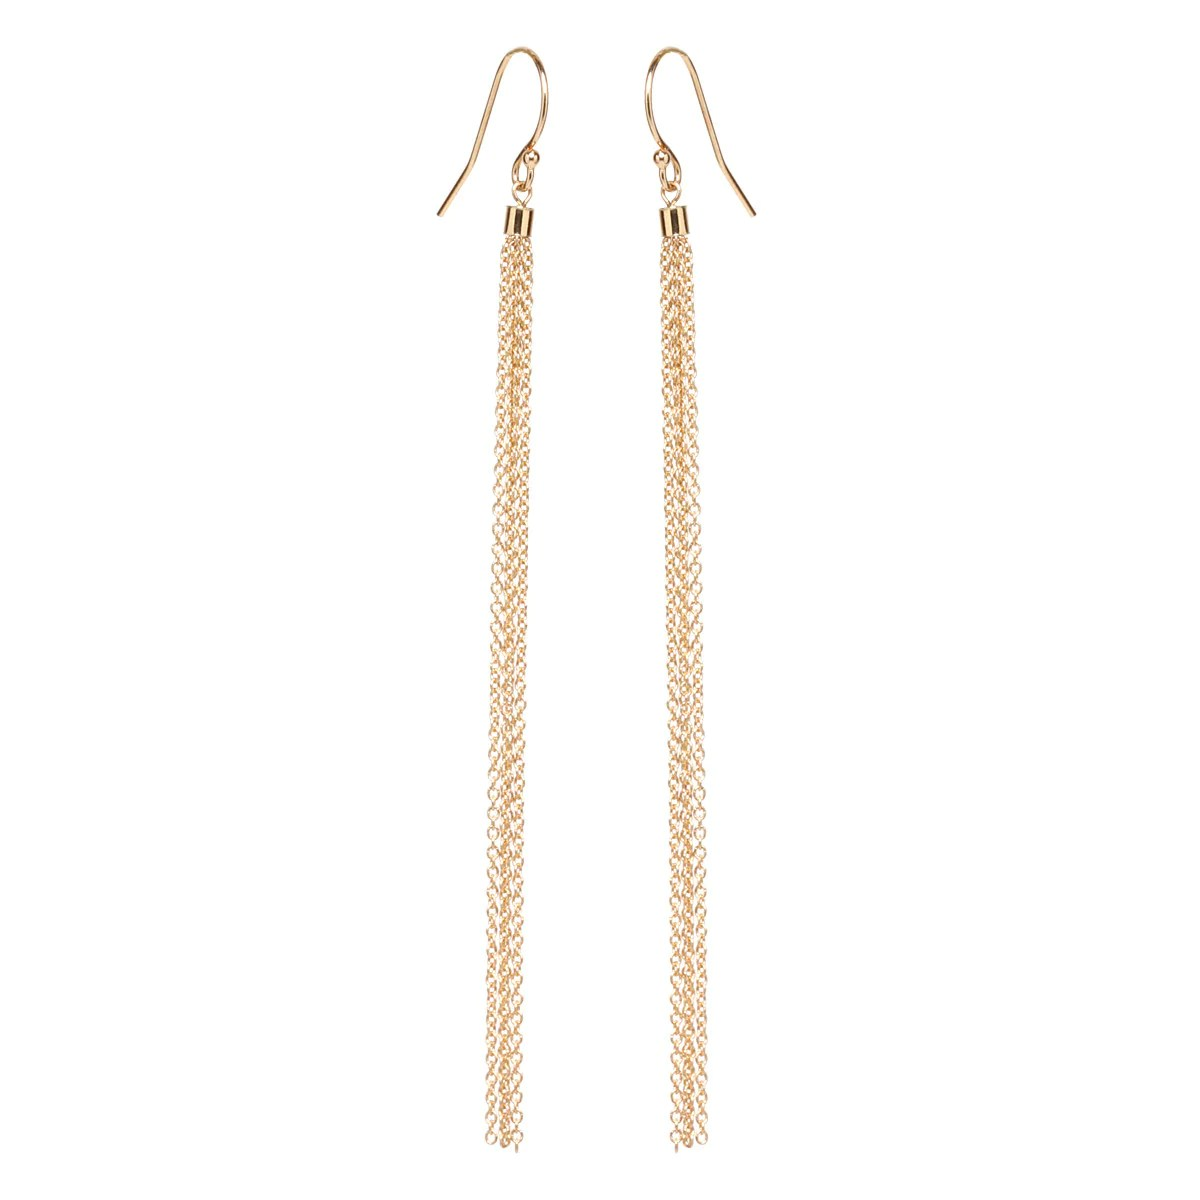 14k Lariat Long Gold Necklaces